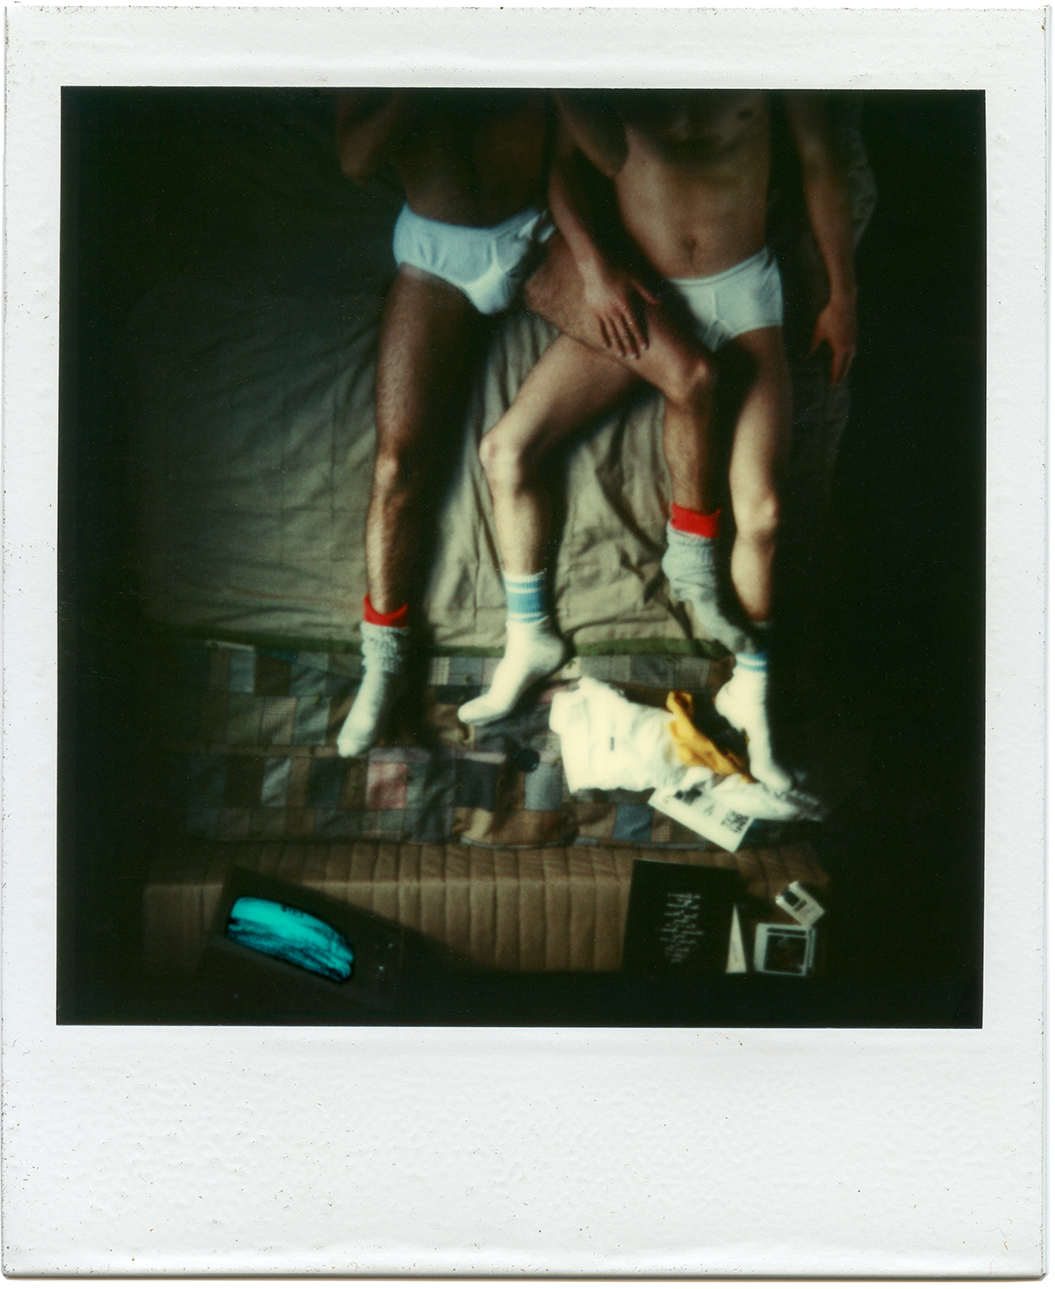 Untitled, 087 63 E 9th Street | NYC Polaroids 1975 - 1983 Unique SX-70 Polaroid, artist frame, Optium Museum Acrylic  4.2 x 3.5 in (10.7 x 8.9 cm) 10.75 x 9.25 x 1 in (27.3 x 23.5 x 2.5 cm) Framed